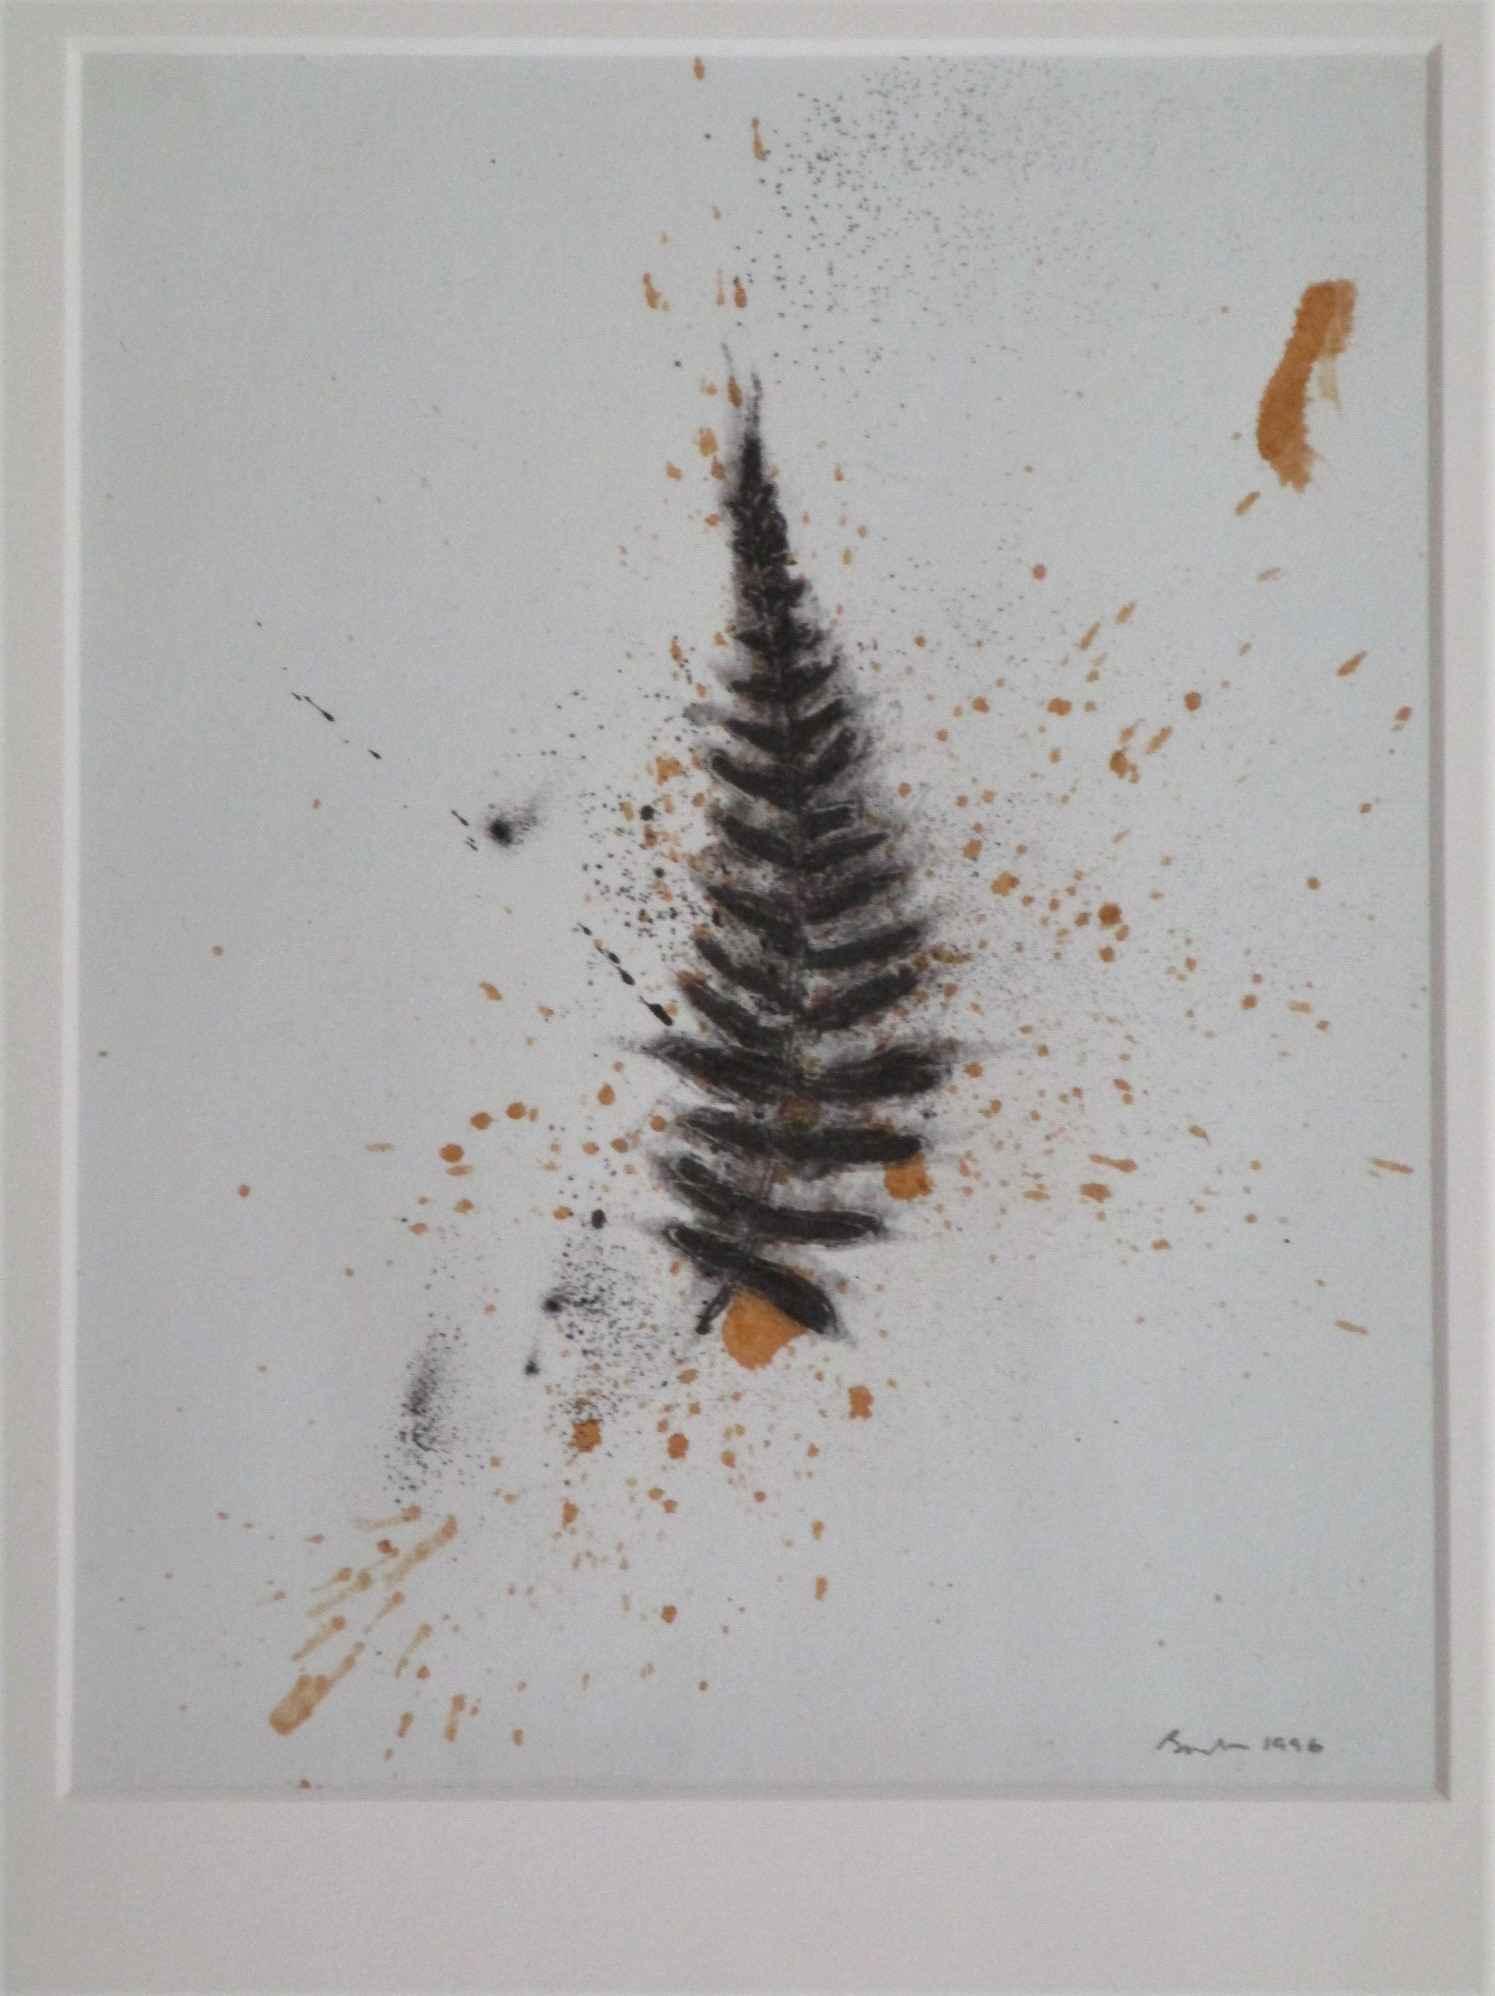 Untitled (Fern frond) by  Brian Borrelo - Masterpiece Online